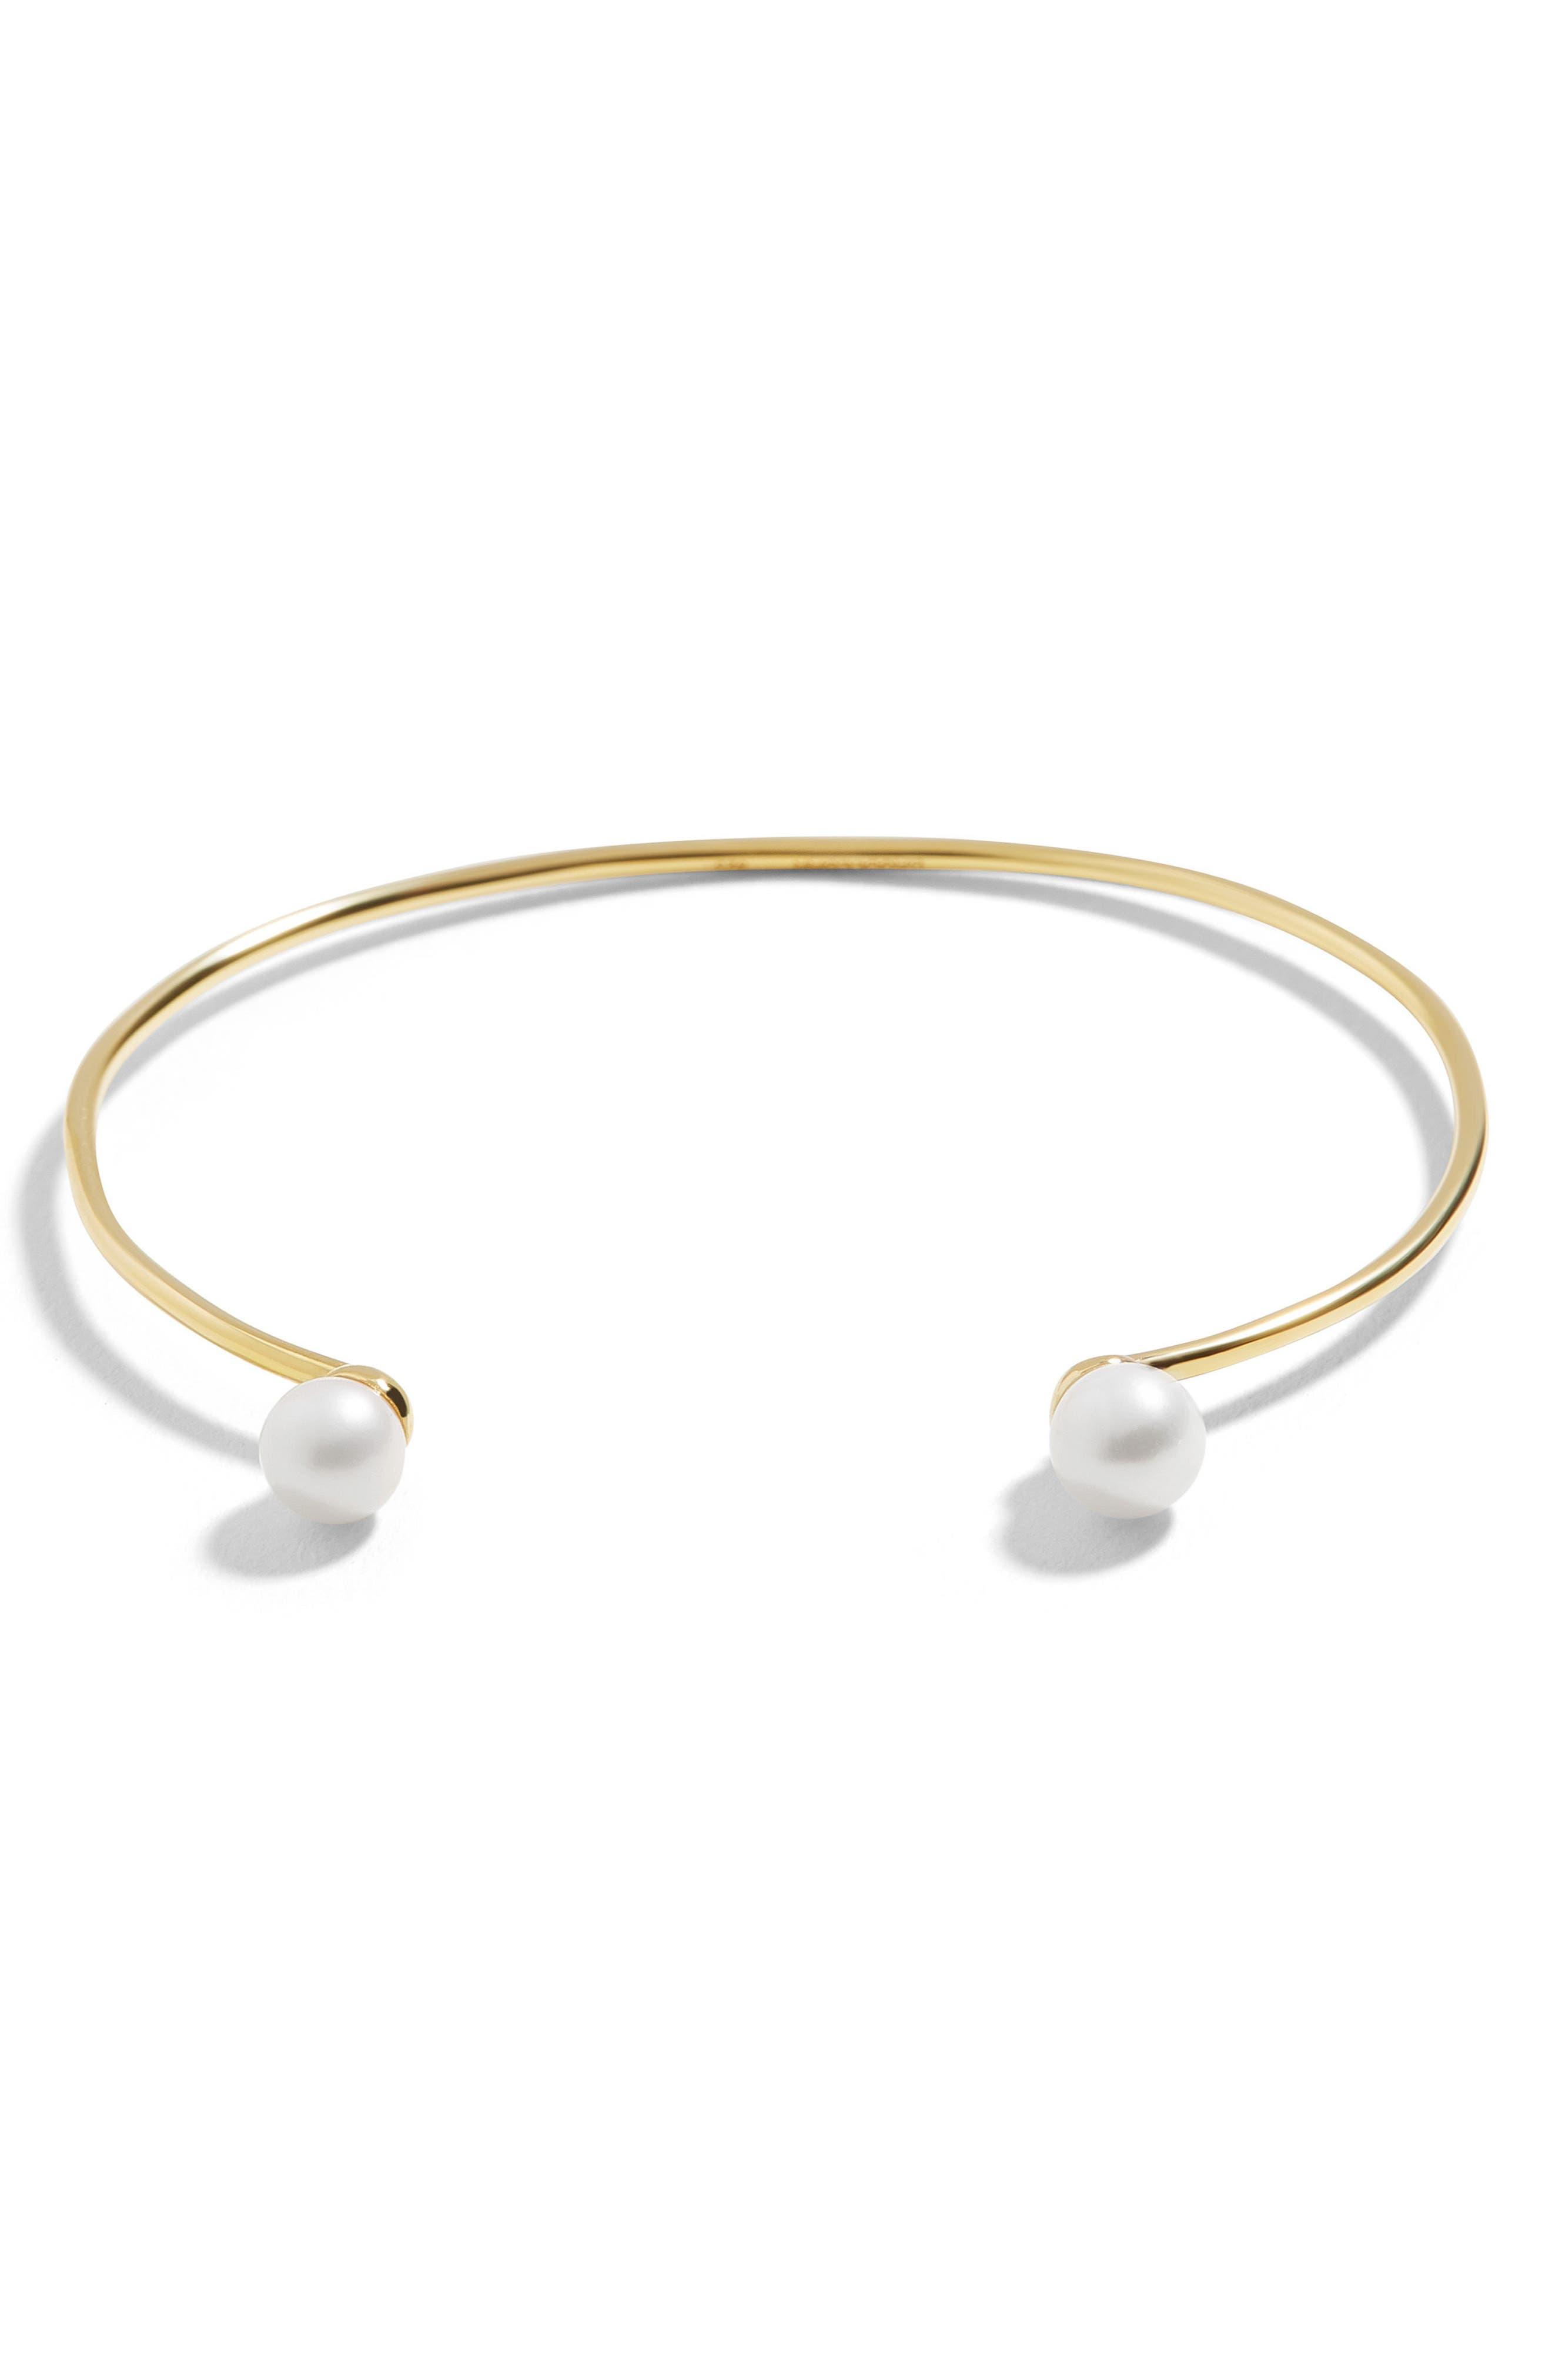 Perla Everyday Fine Cuff Bracelet,                             Main thumbnail 1, color,                             109